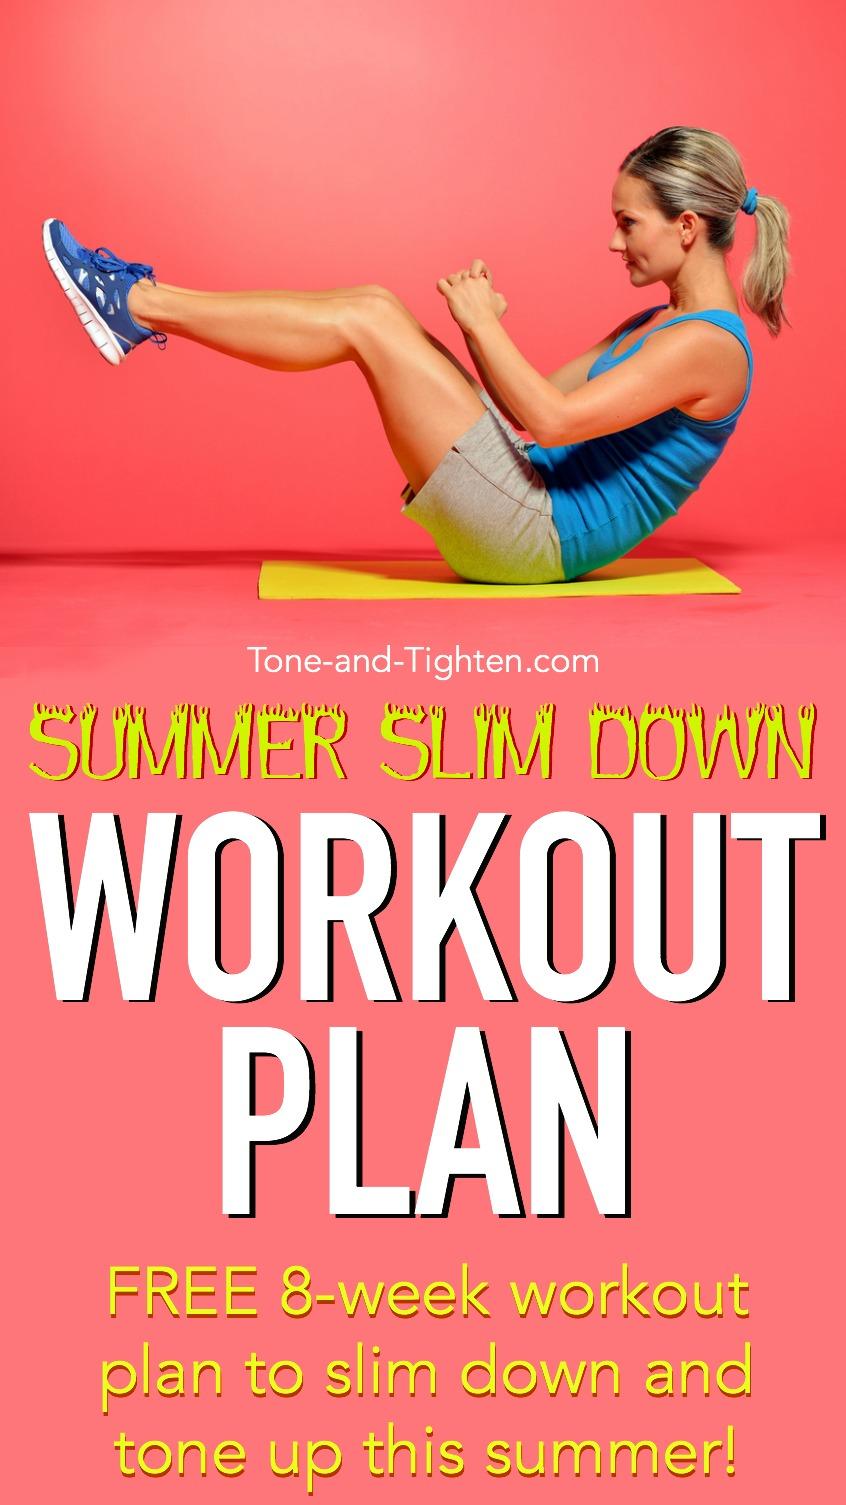 8 Week Summer Slim Down Workout Plan | Tone and Tighten